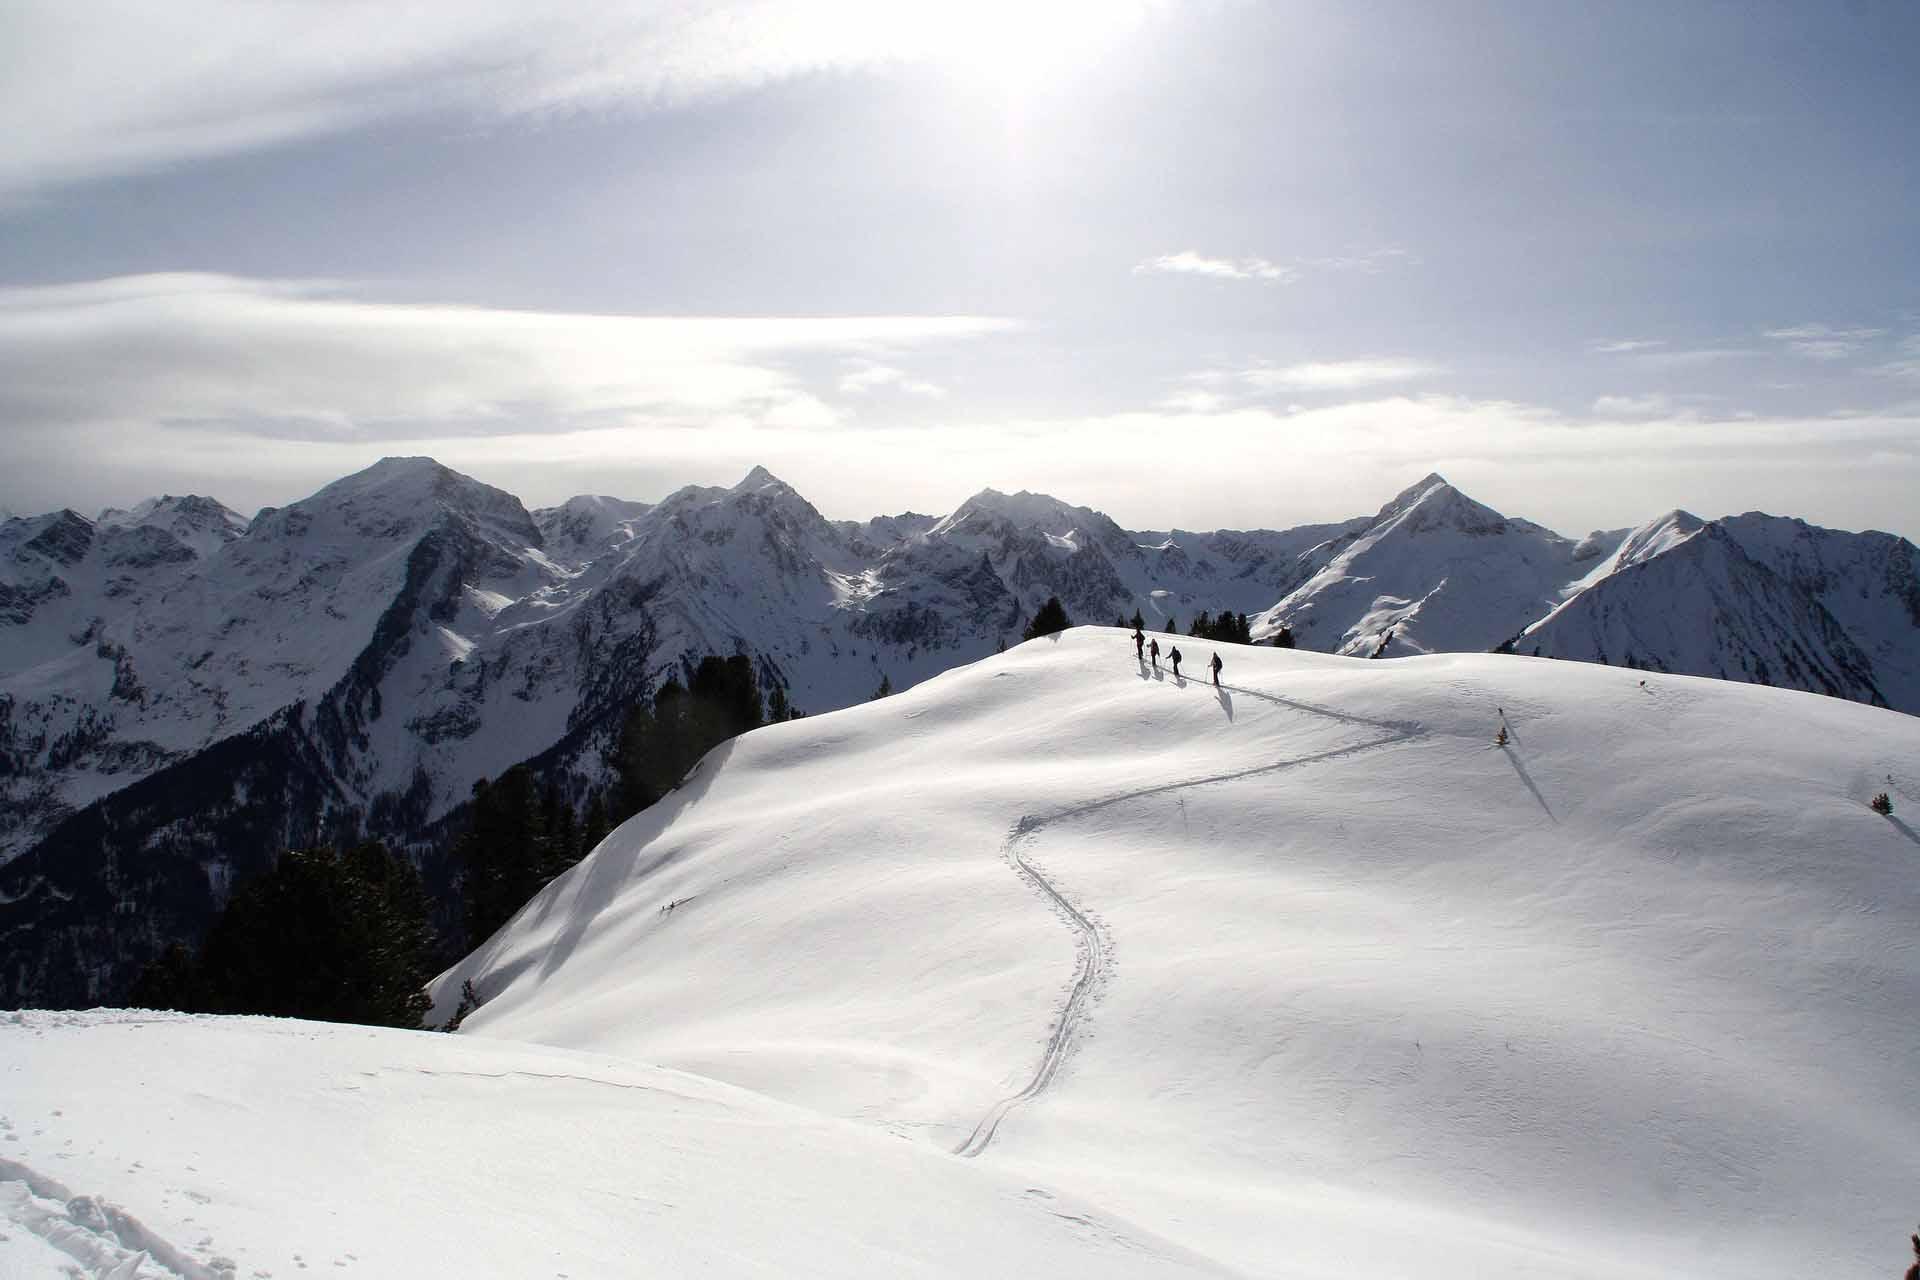 Ski touring in the Pitztal